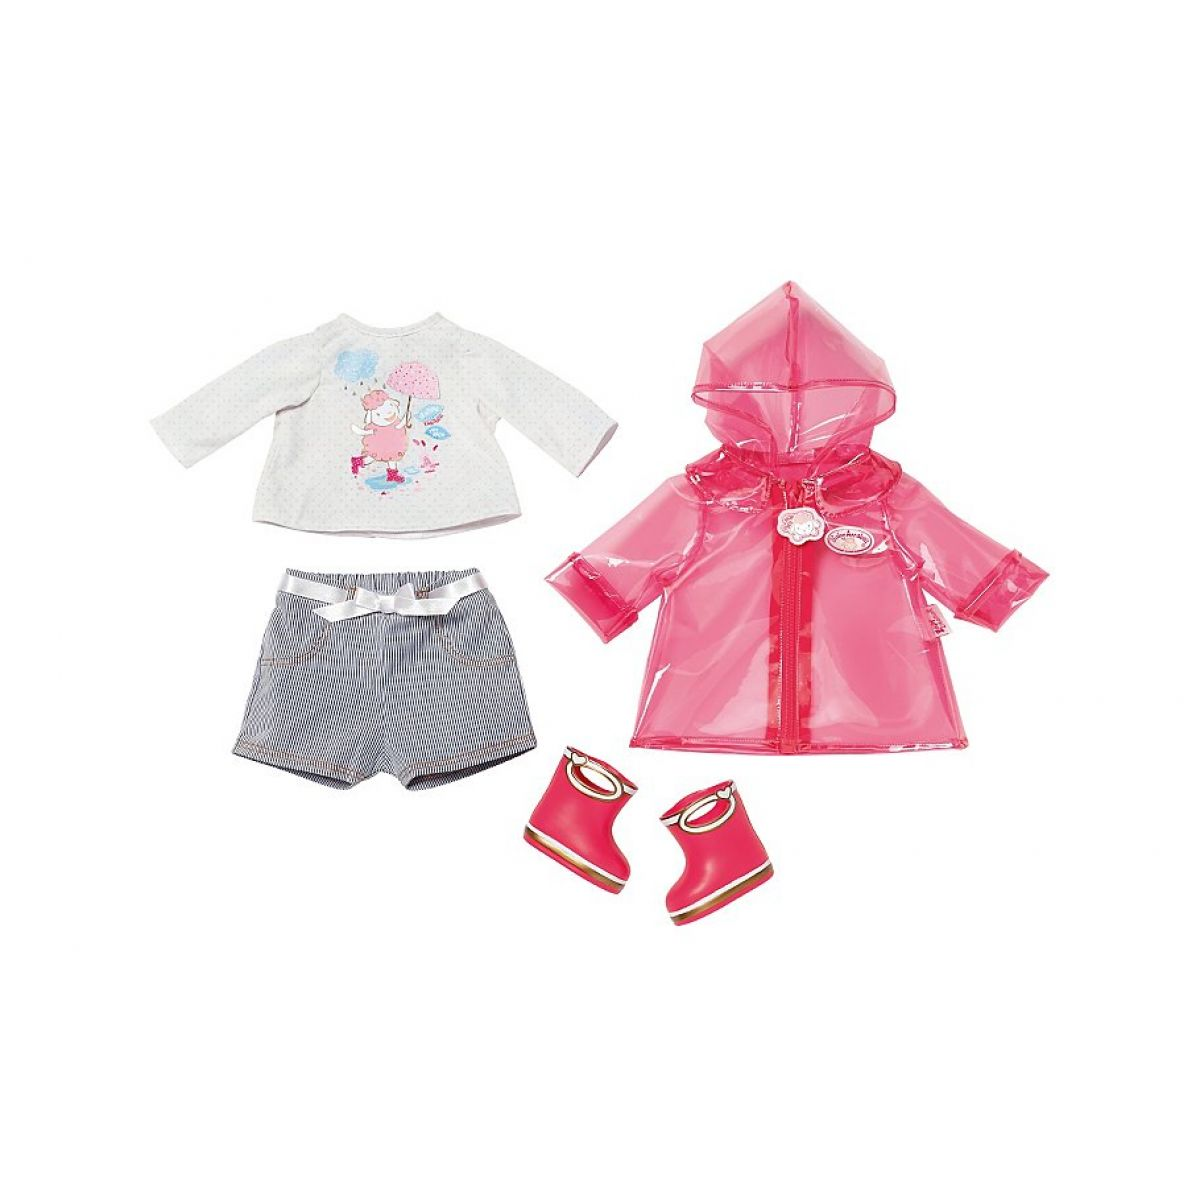 Baby Annabell Souprava do deště s holínkami